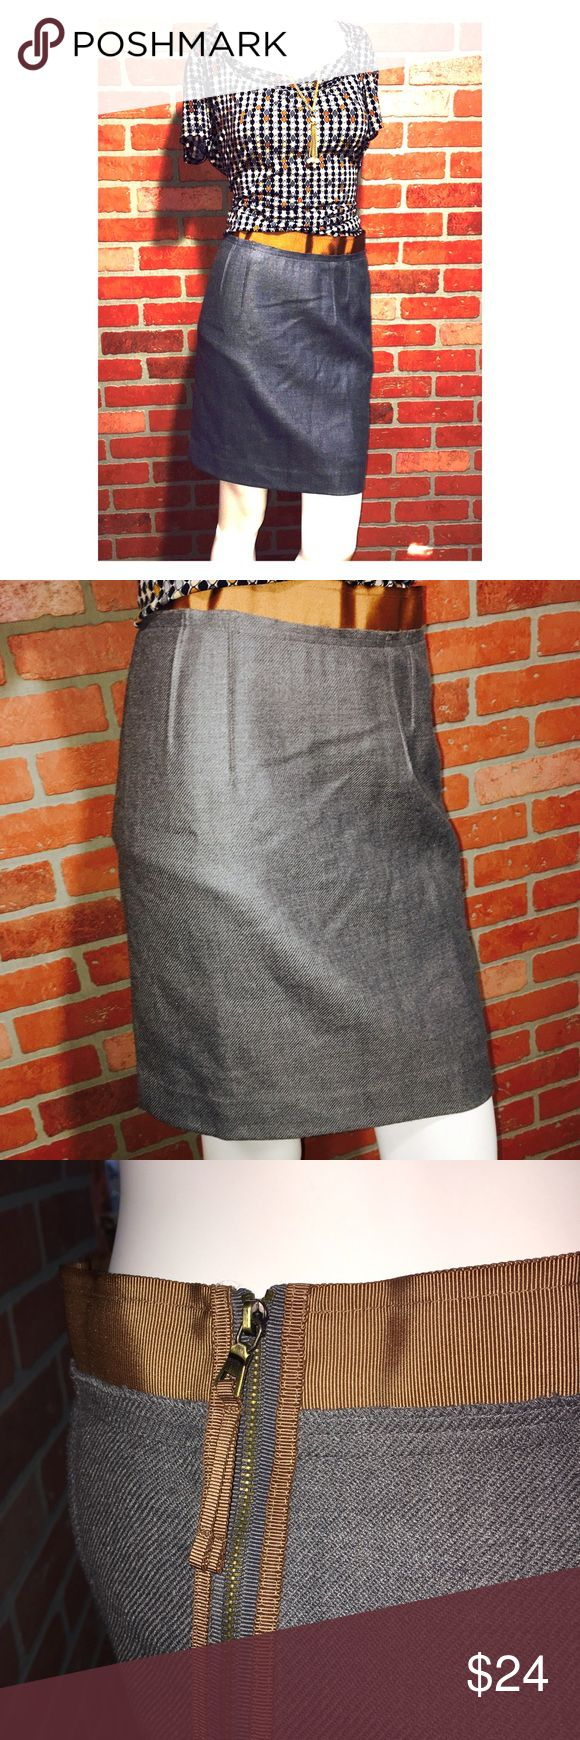 "Ann Taylor Loft Petite skirt Never worn. Sz 4 petite. Band around waist. 19"" long. 70% wool 30% polyester. Lining is 💯 acetate. Ann Taylor Skirts Mini"